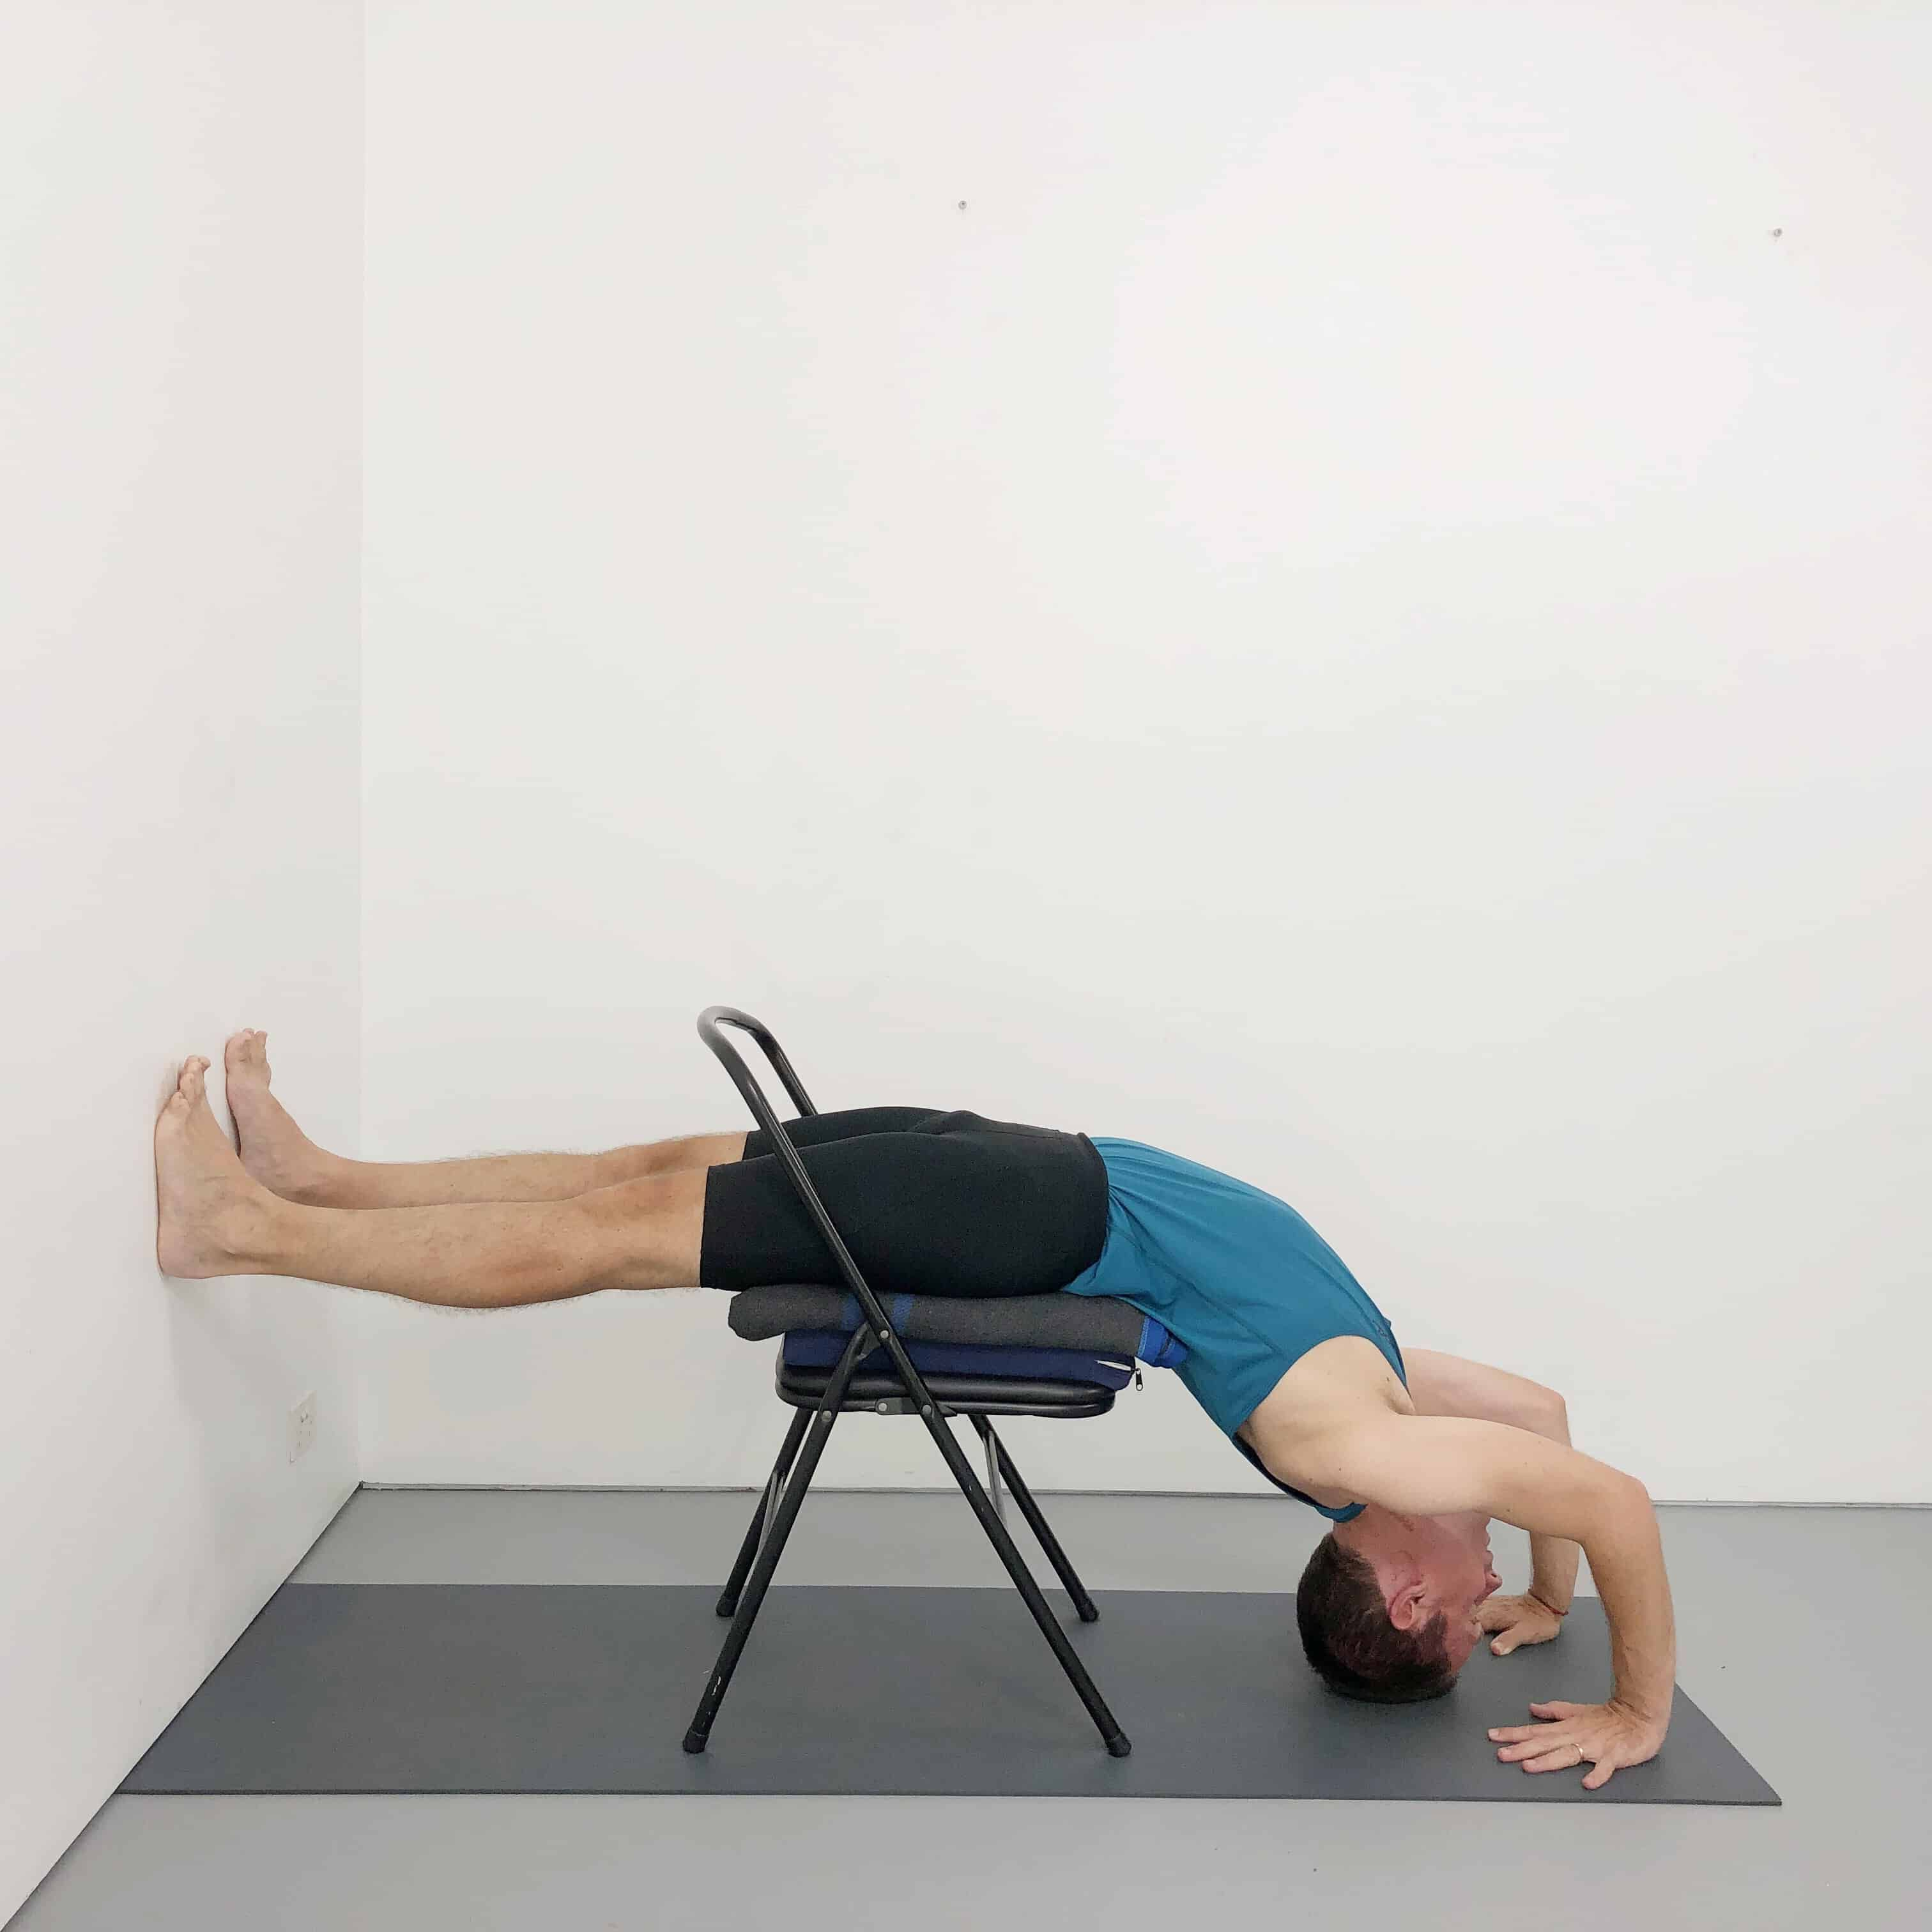 Iyengar Yoga Chair Backbends Yoga Selection Iyengar Yoga Yoga Backbend Chair Yoga